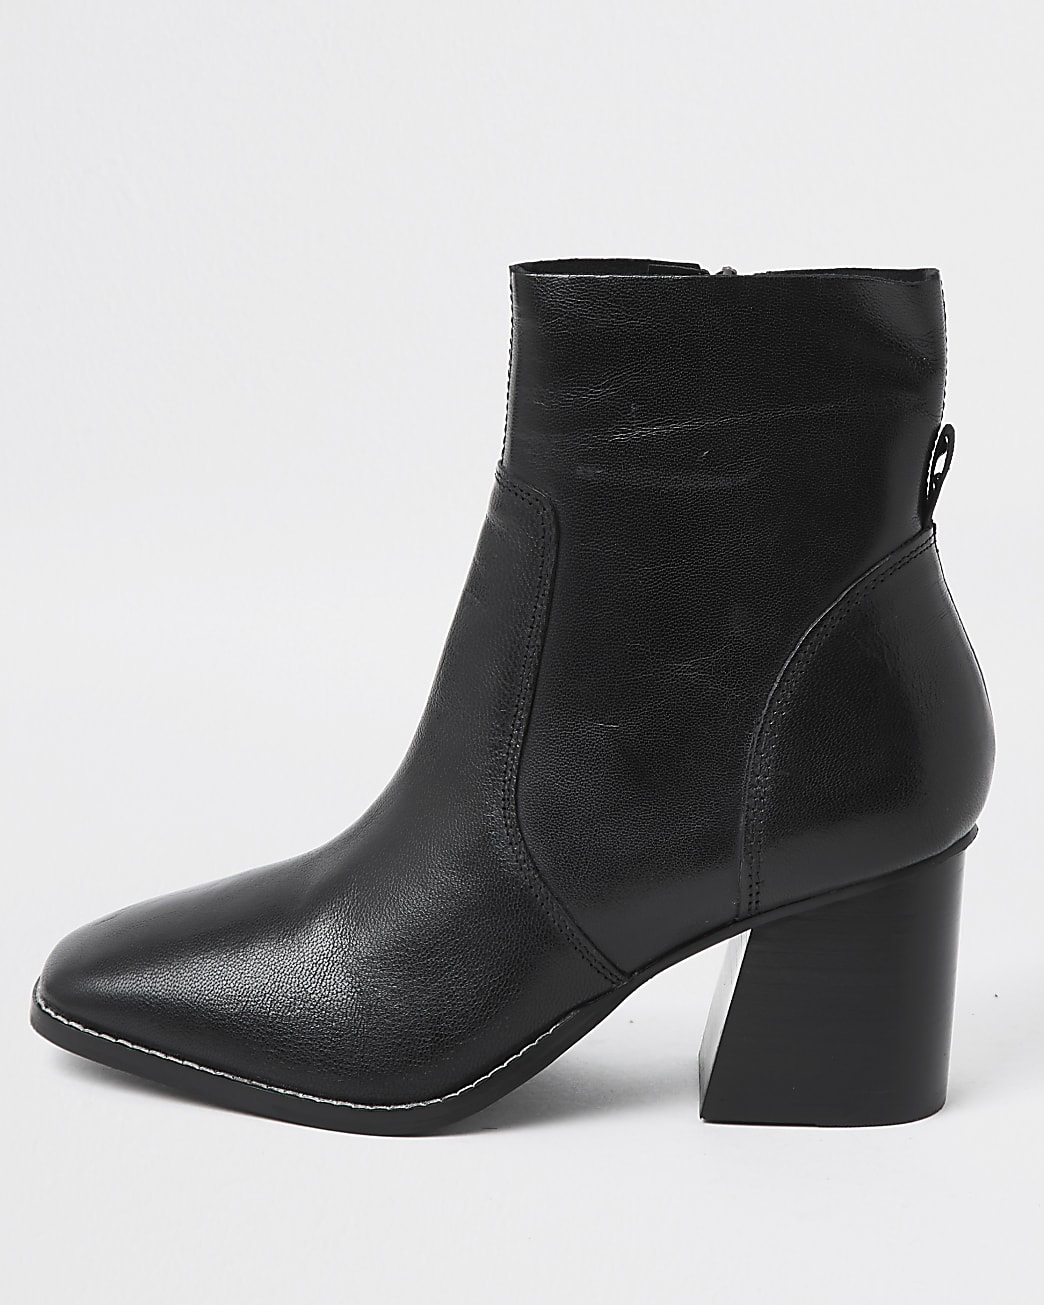 Black leather block heel ankle boot